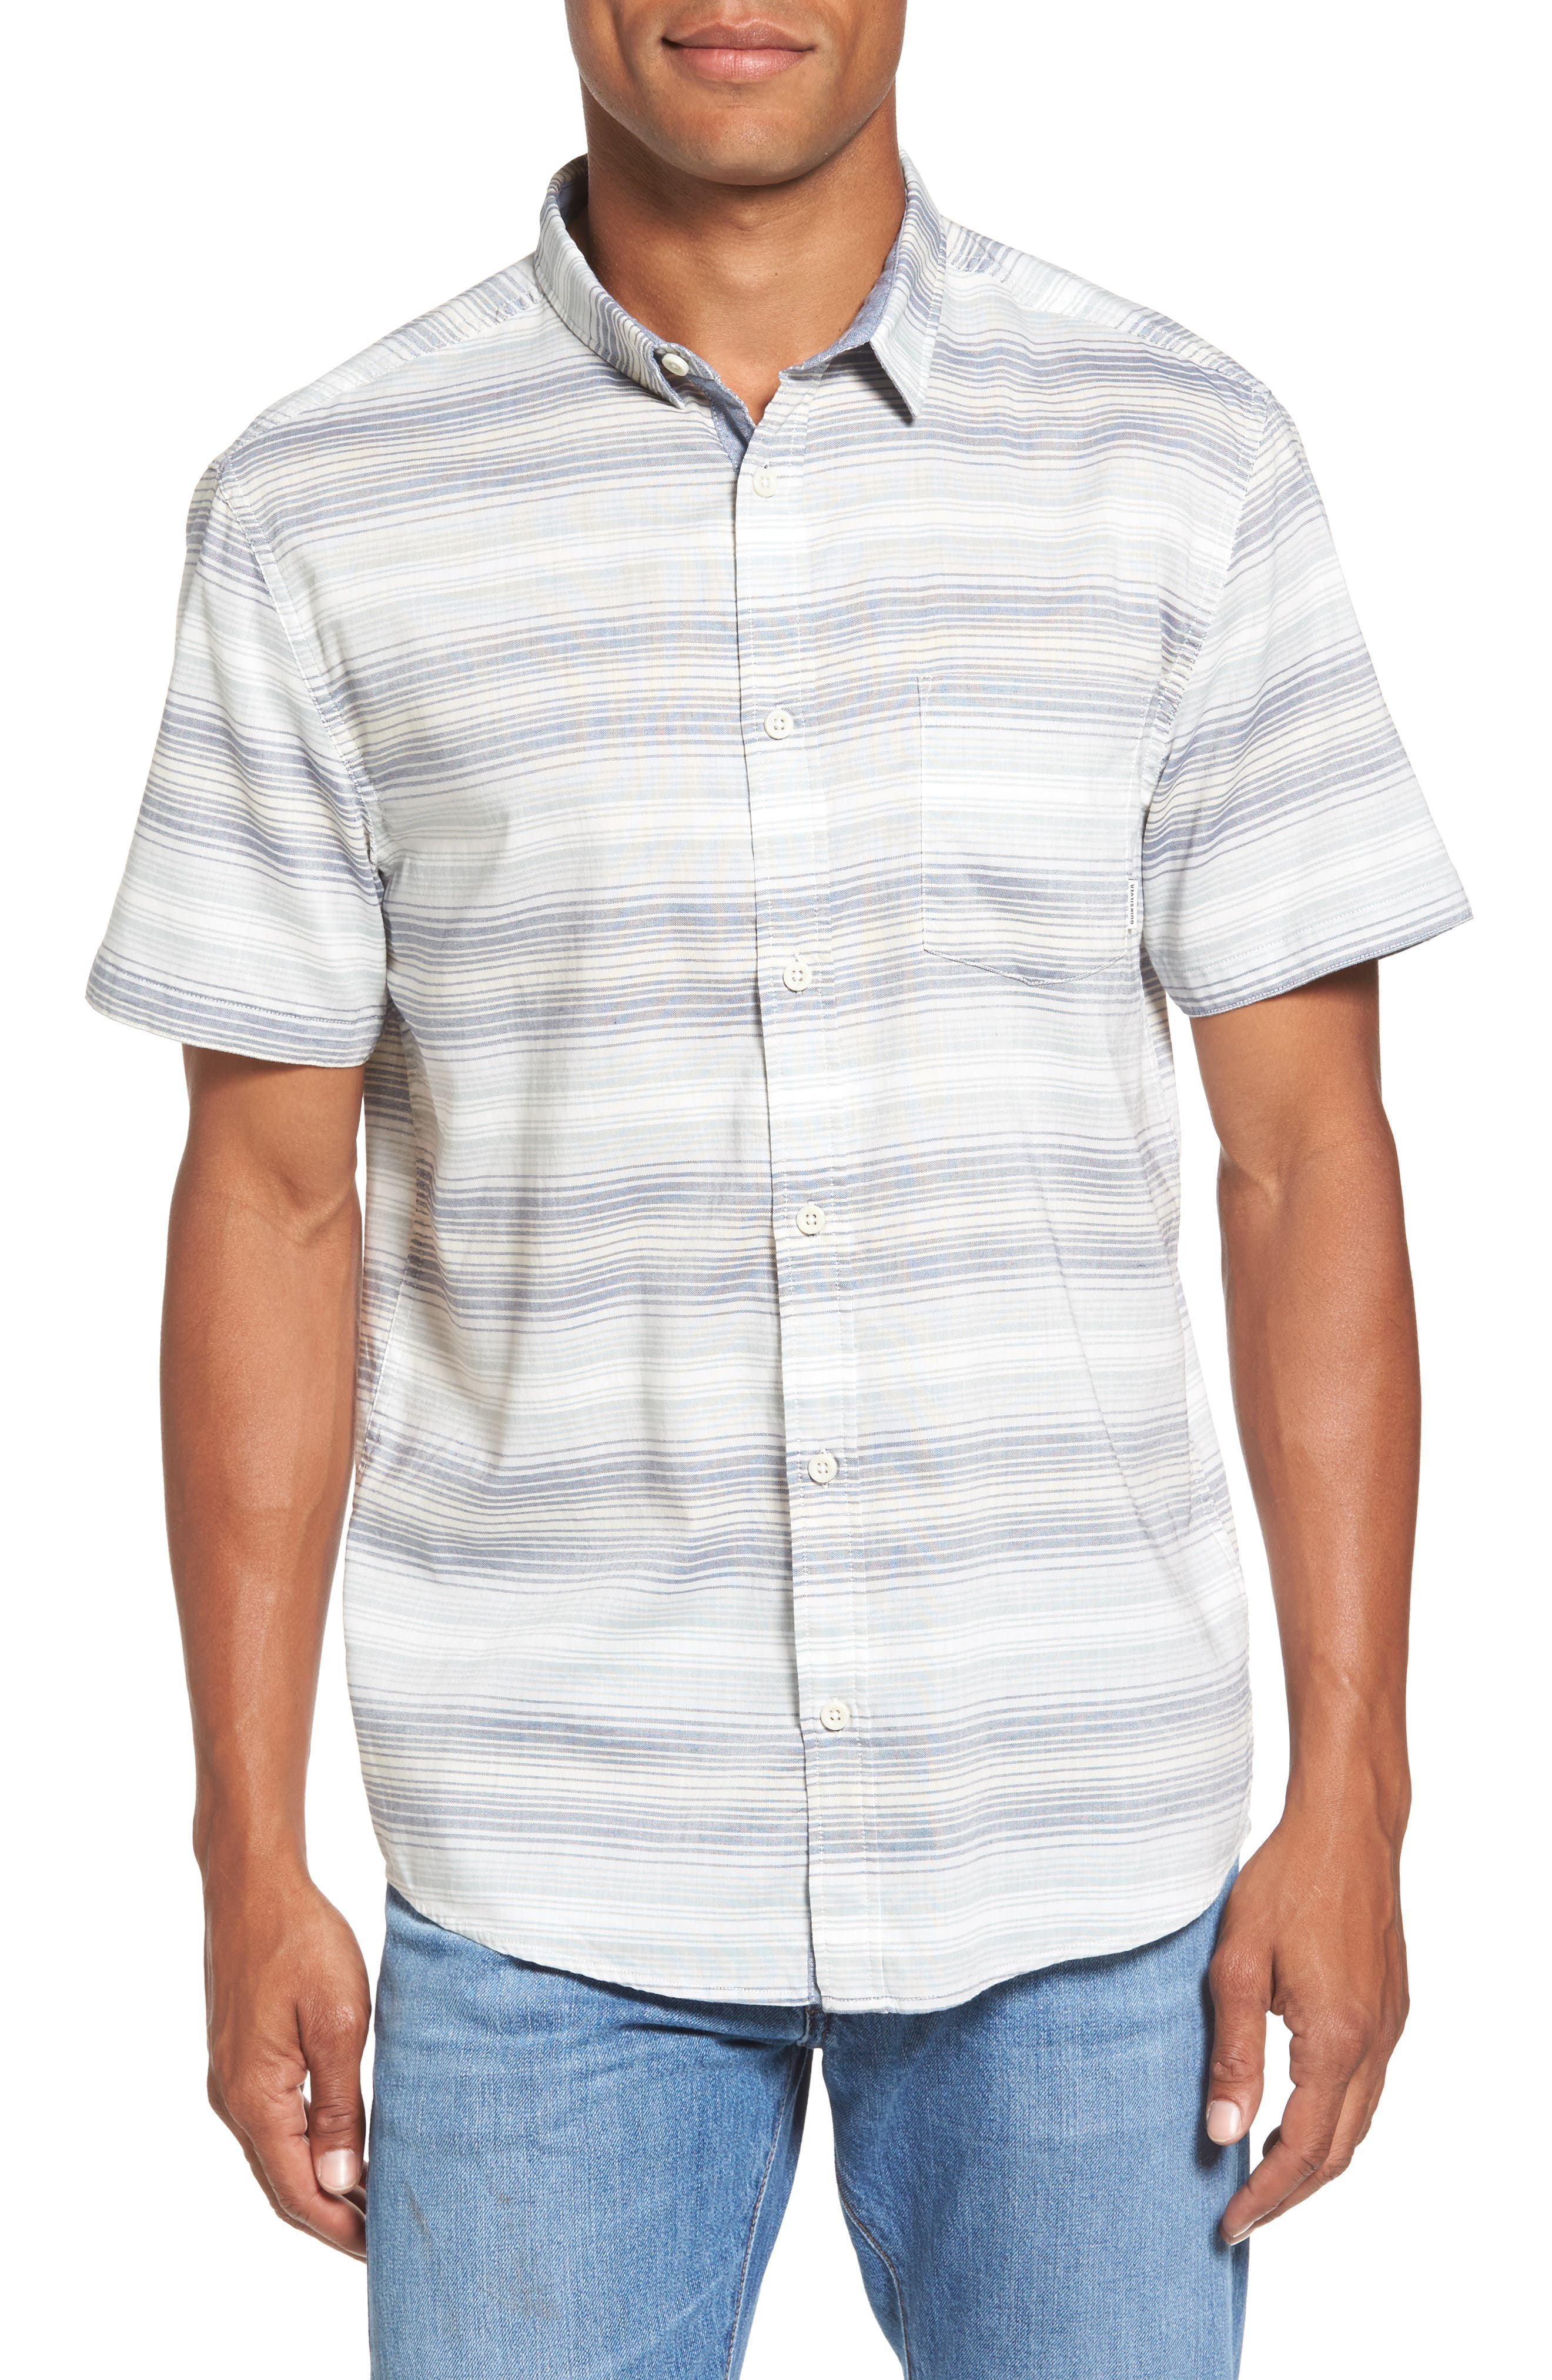 Quiksilver Aventail Stripe Shirt